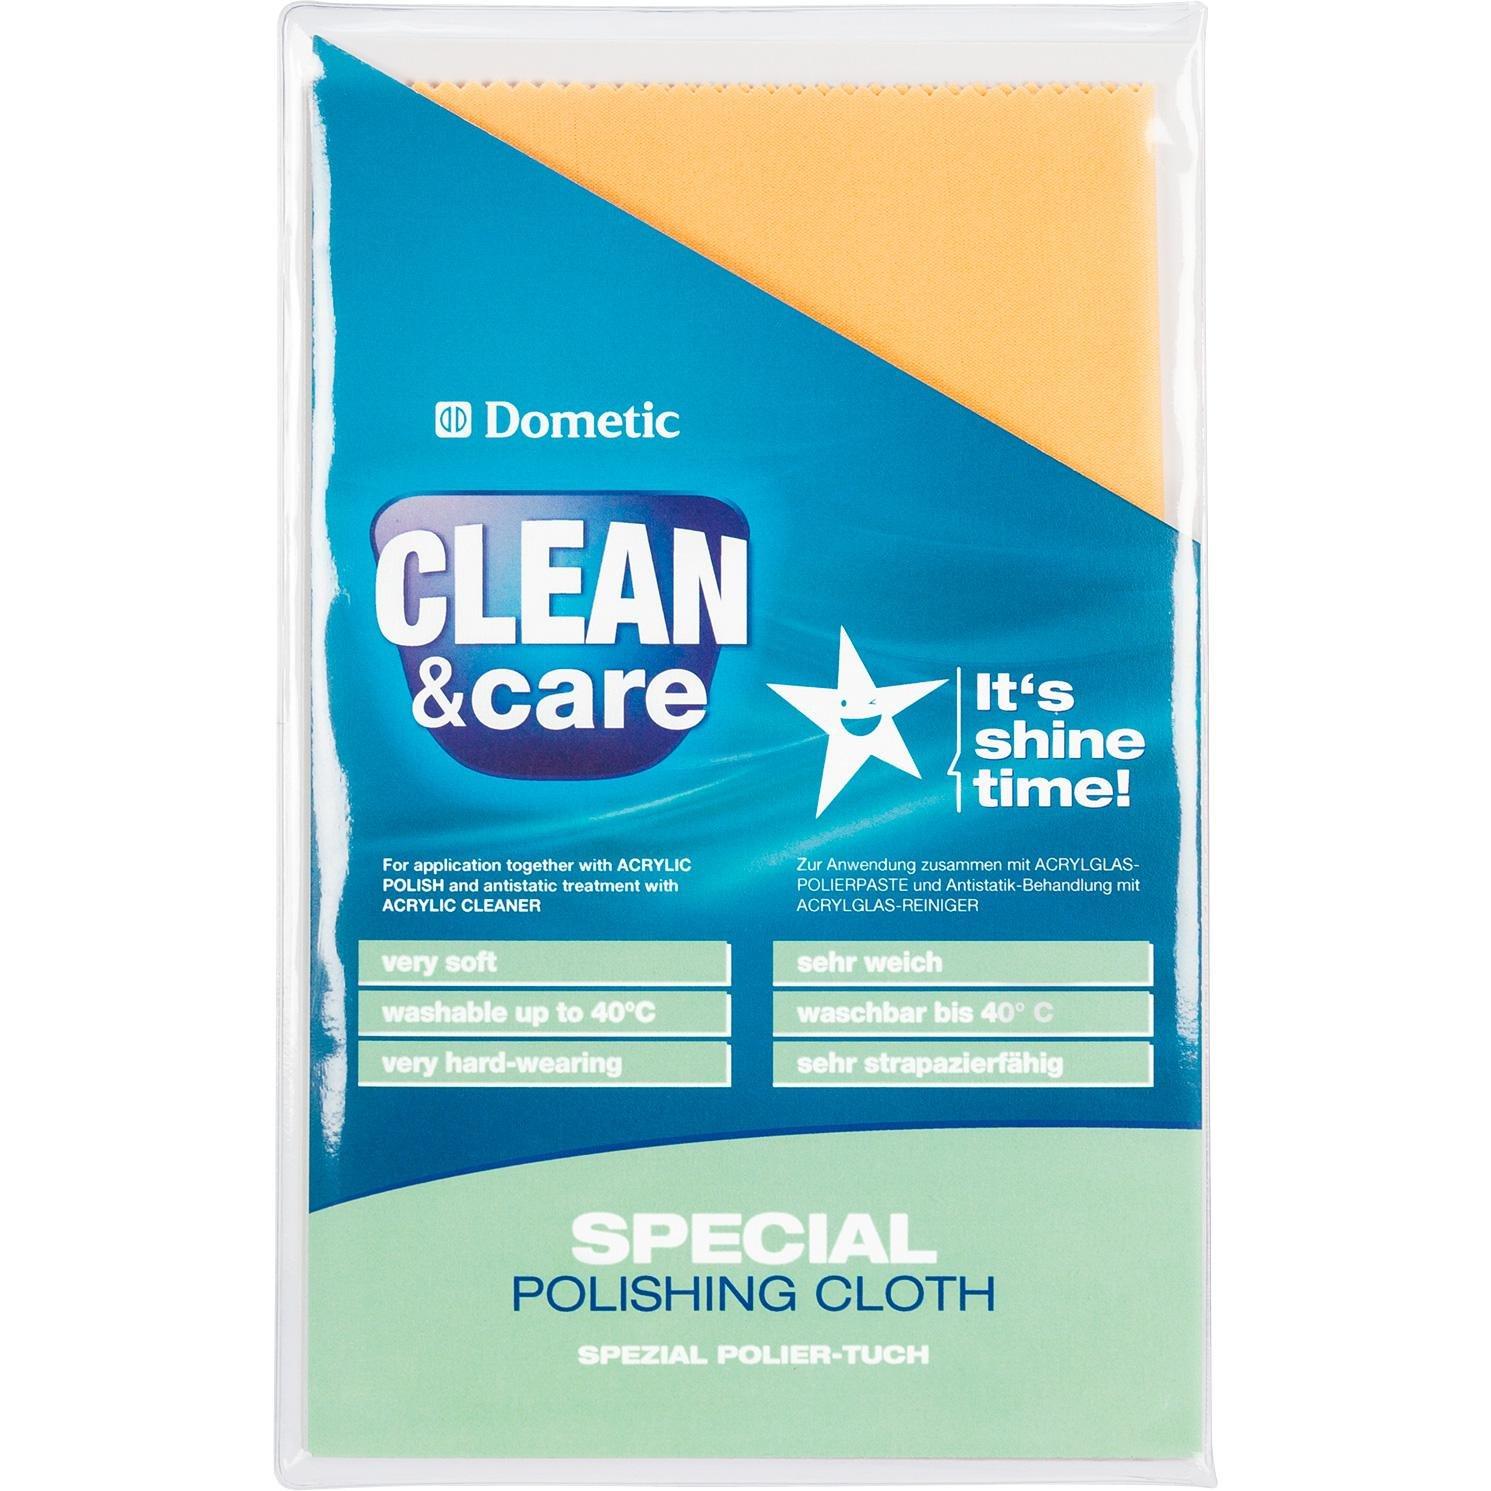 Dometic Clean&Care Spezial-Poliertuch | 04015704234695